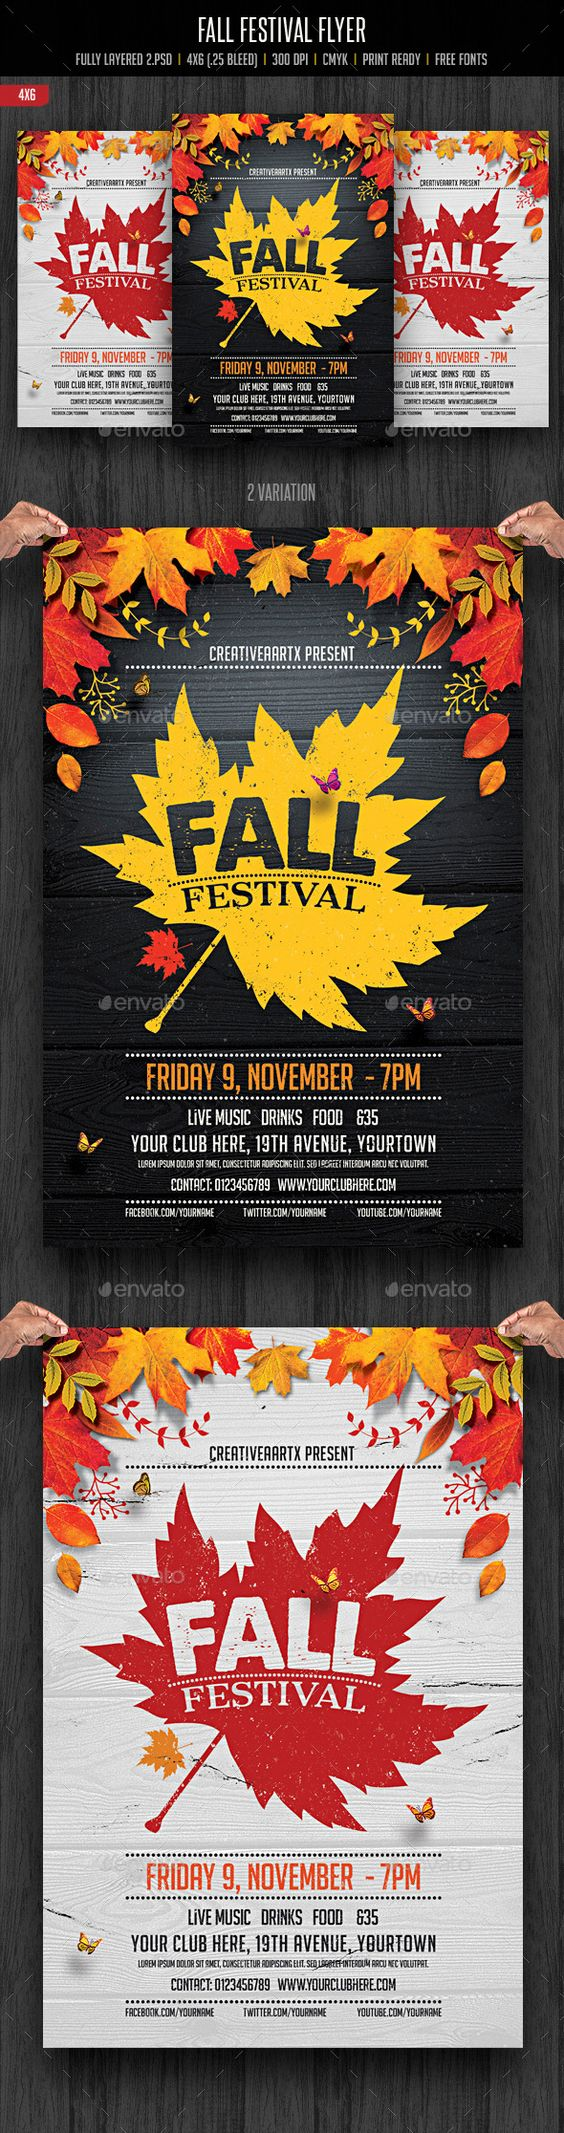 locandina-fall-festival